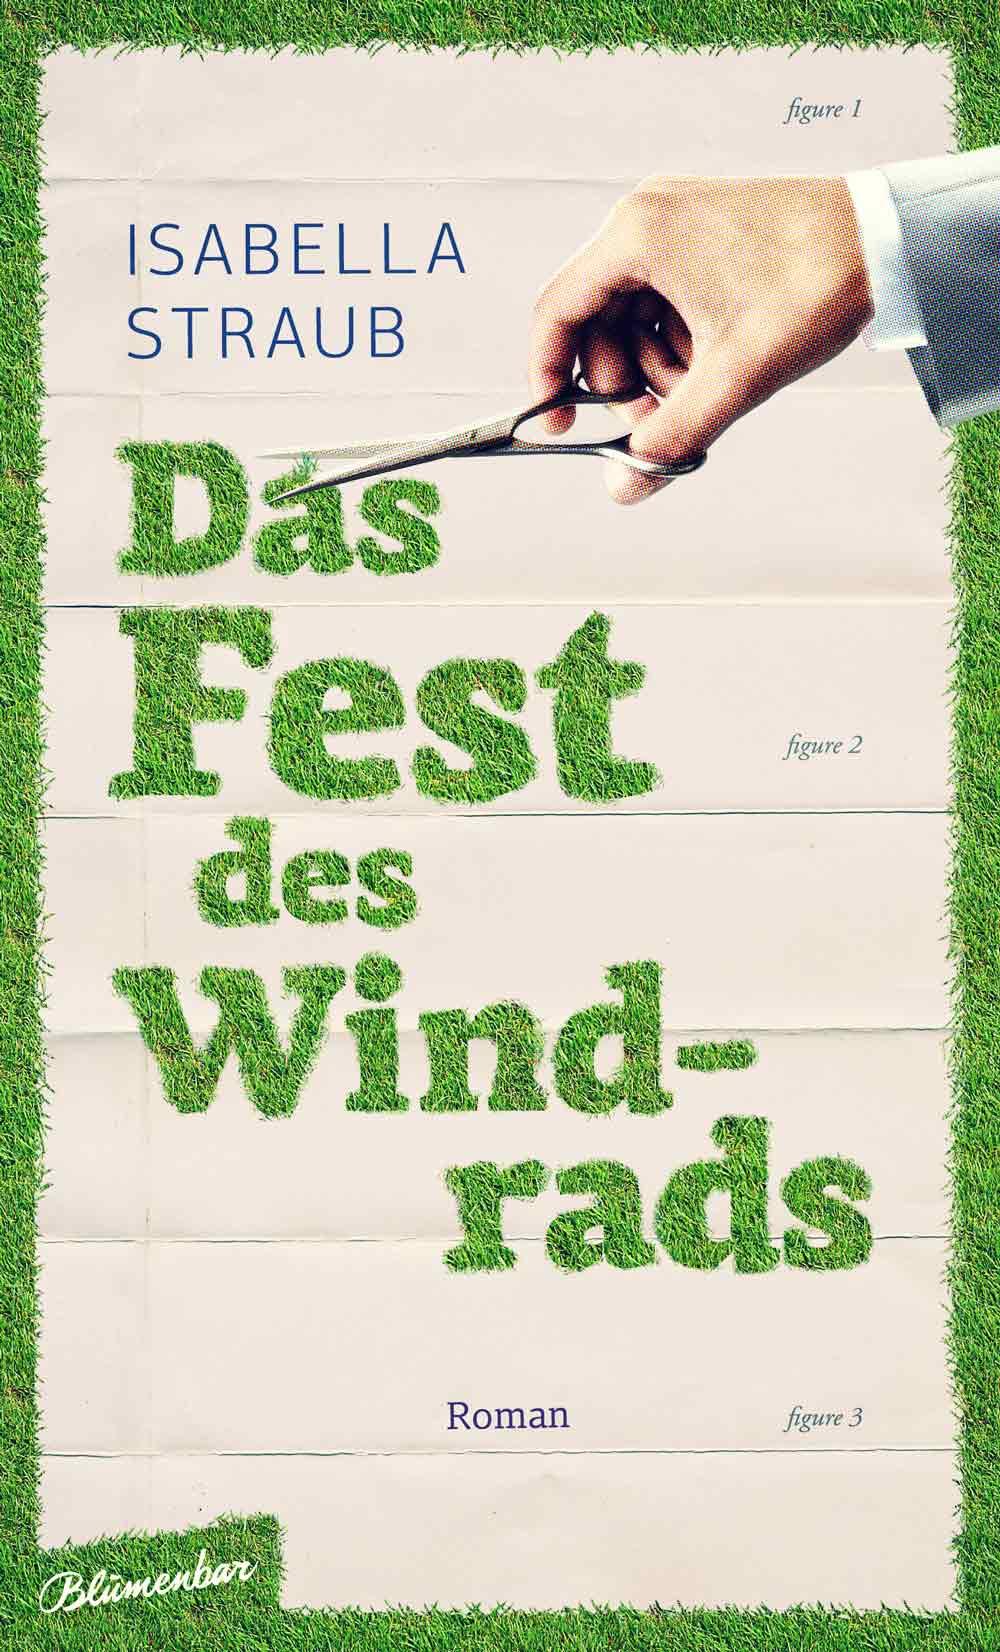 Buchcover: Das Fest des Windrads